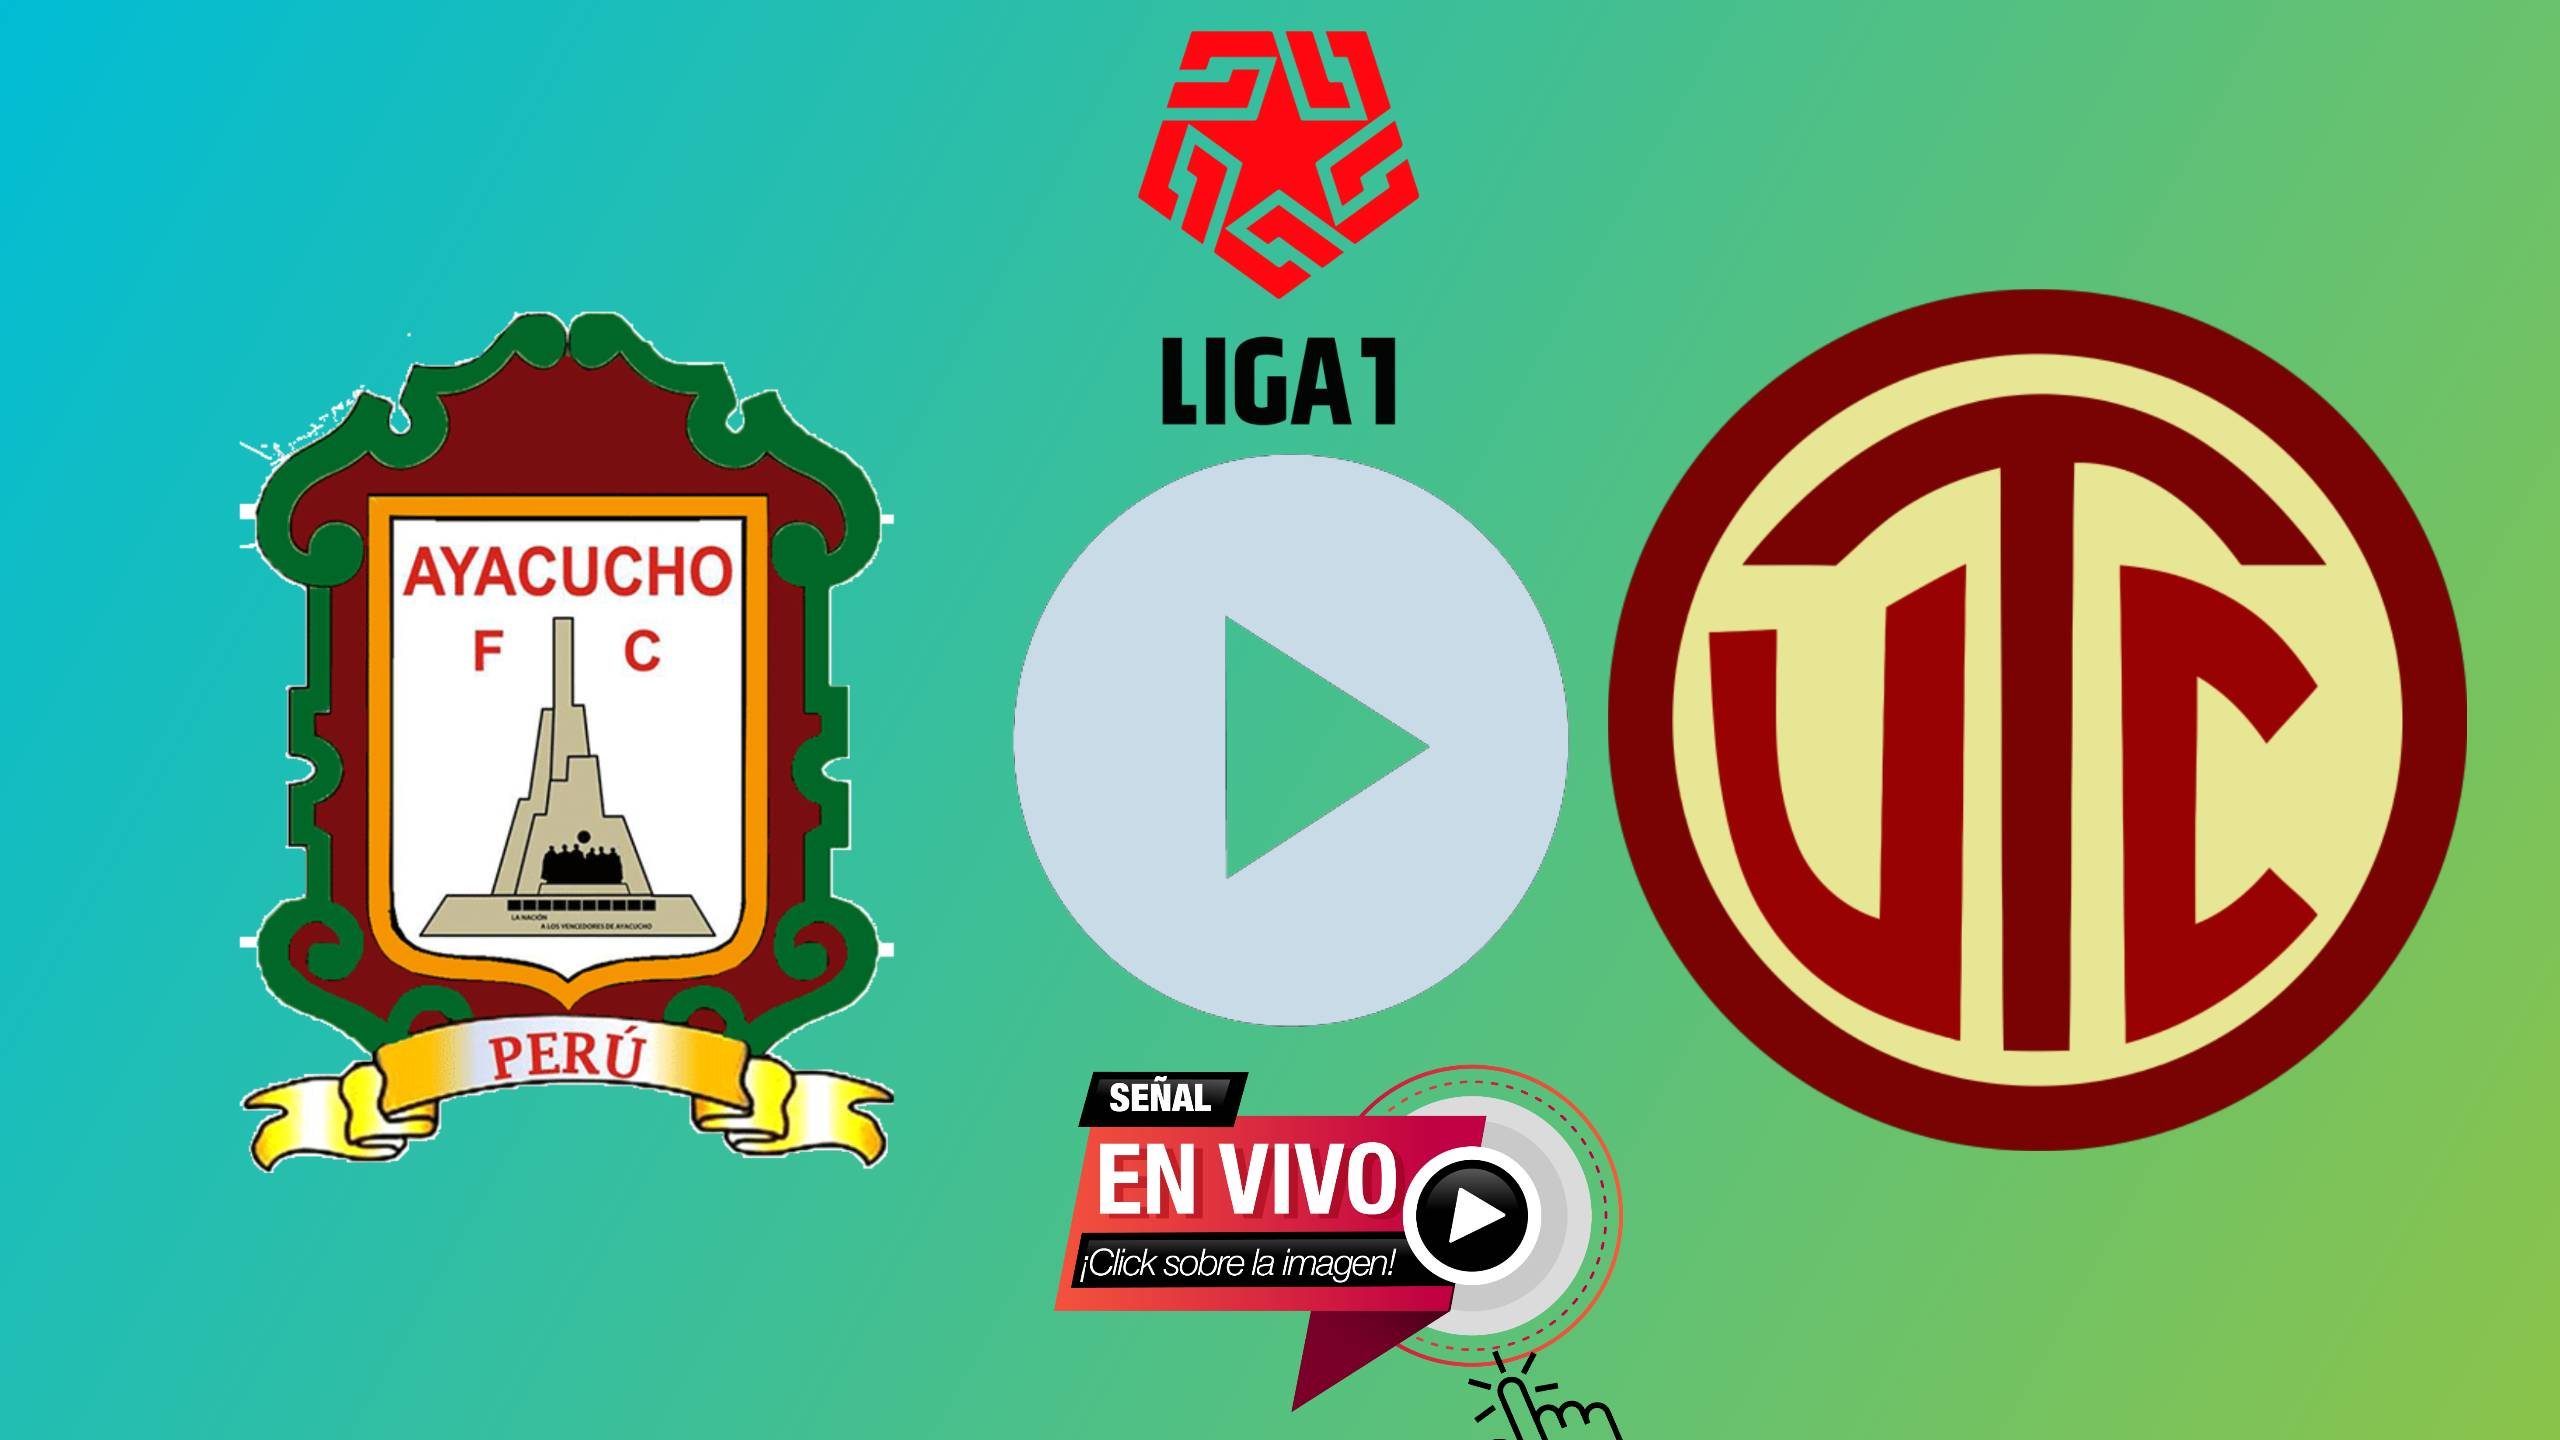 AQUI HOY EN VIVO GRATIS Ayacucho FC vs UTC CAJAMARCA